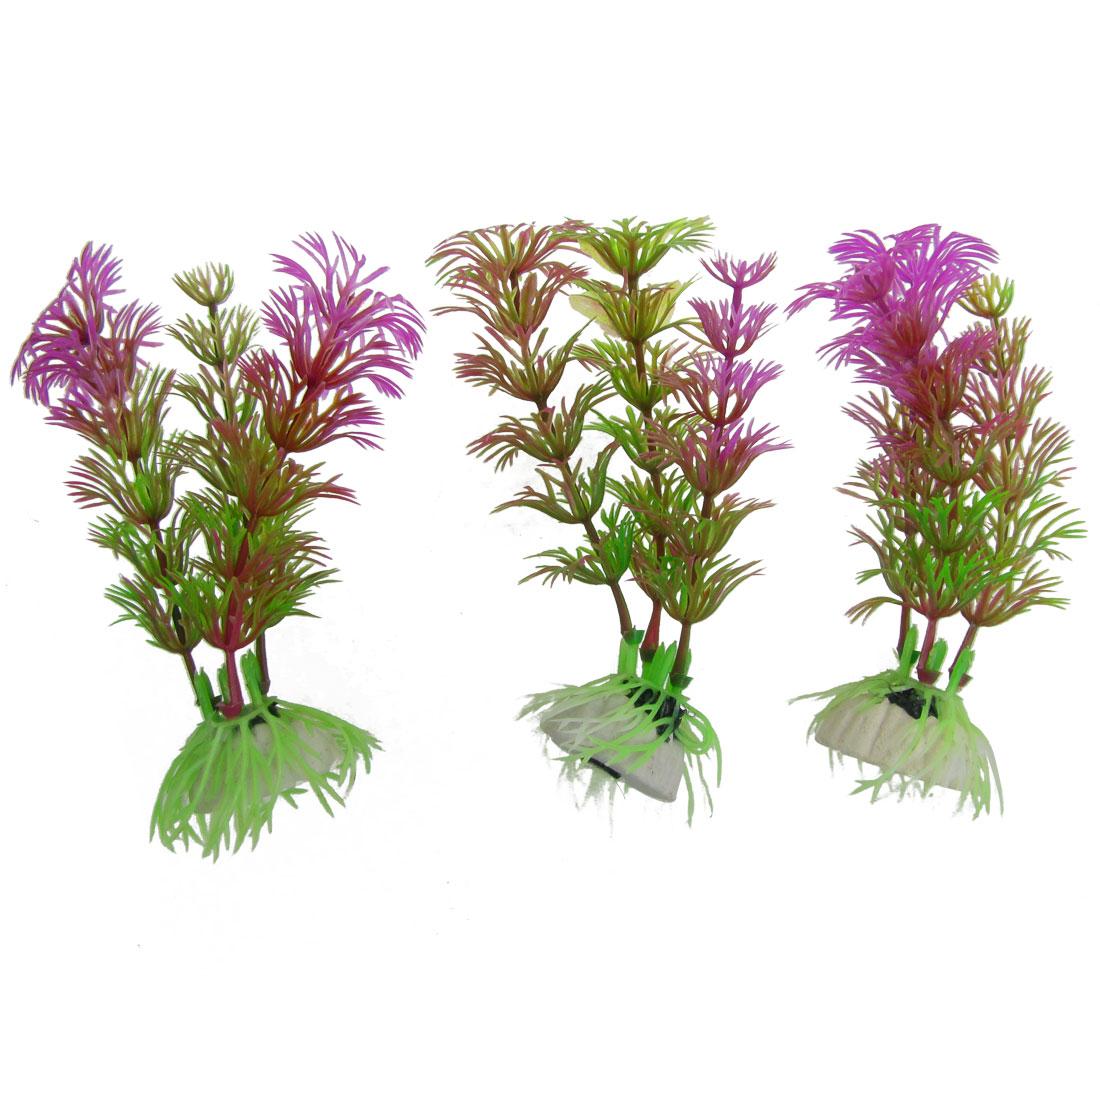 "Aquarium 3 Pieces 4.3"" High Green Purple Emulational Water Grasses Ornament"